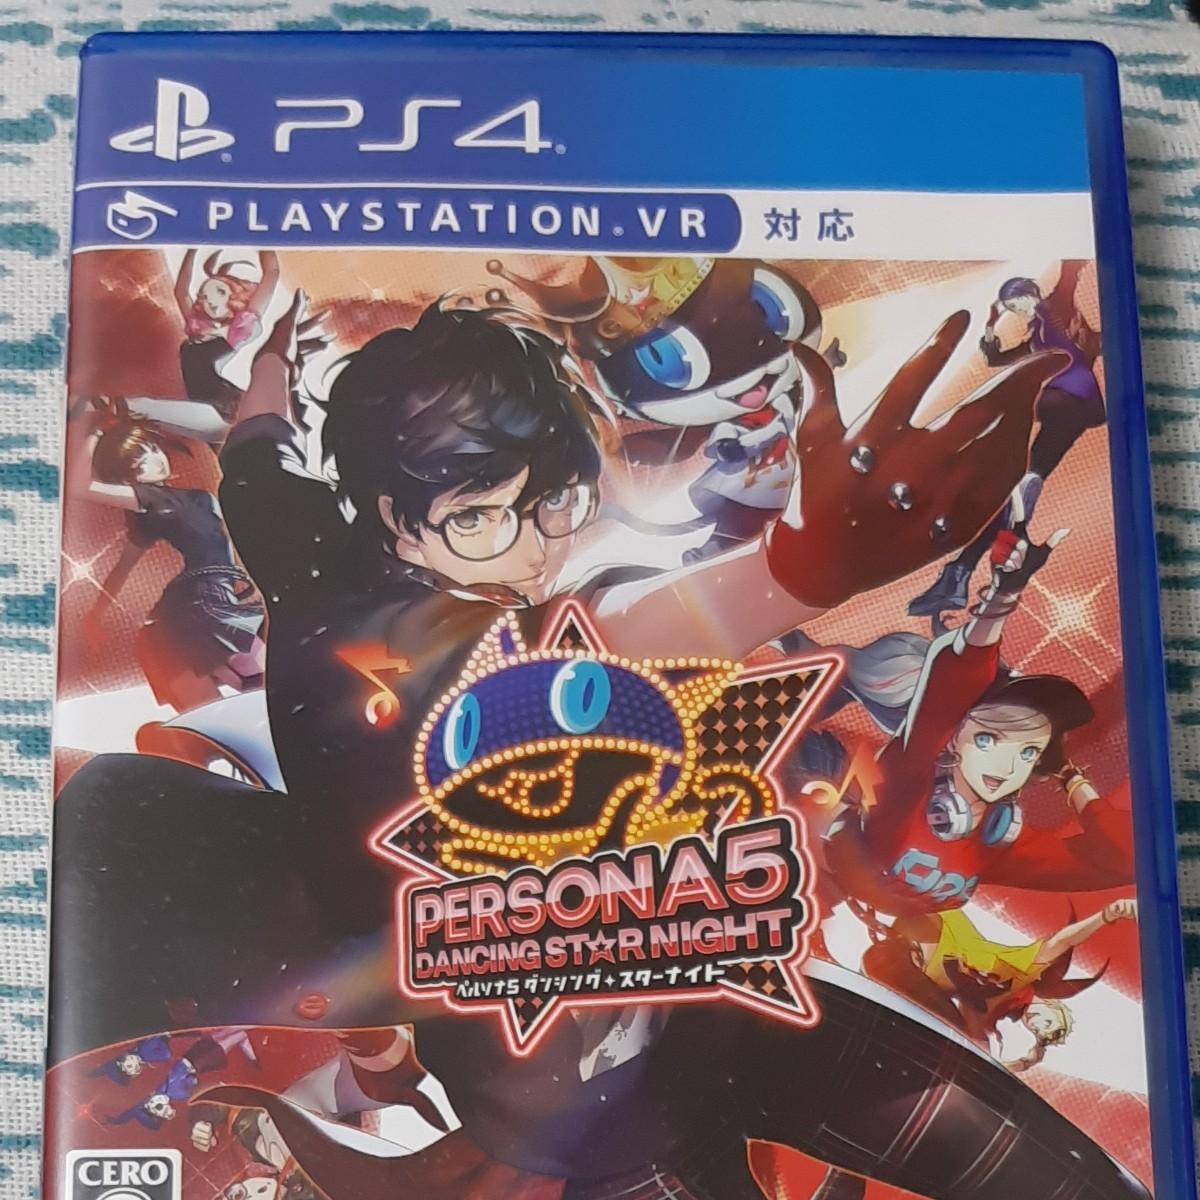 【PS4】 ペルソナ5 ダンシング・スターナイト [通常版] PS4ソフト PlayStation VR